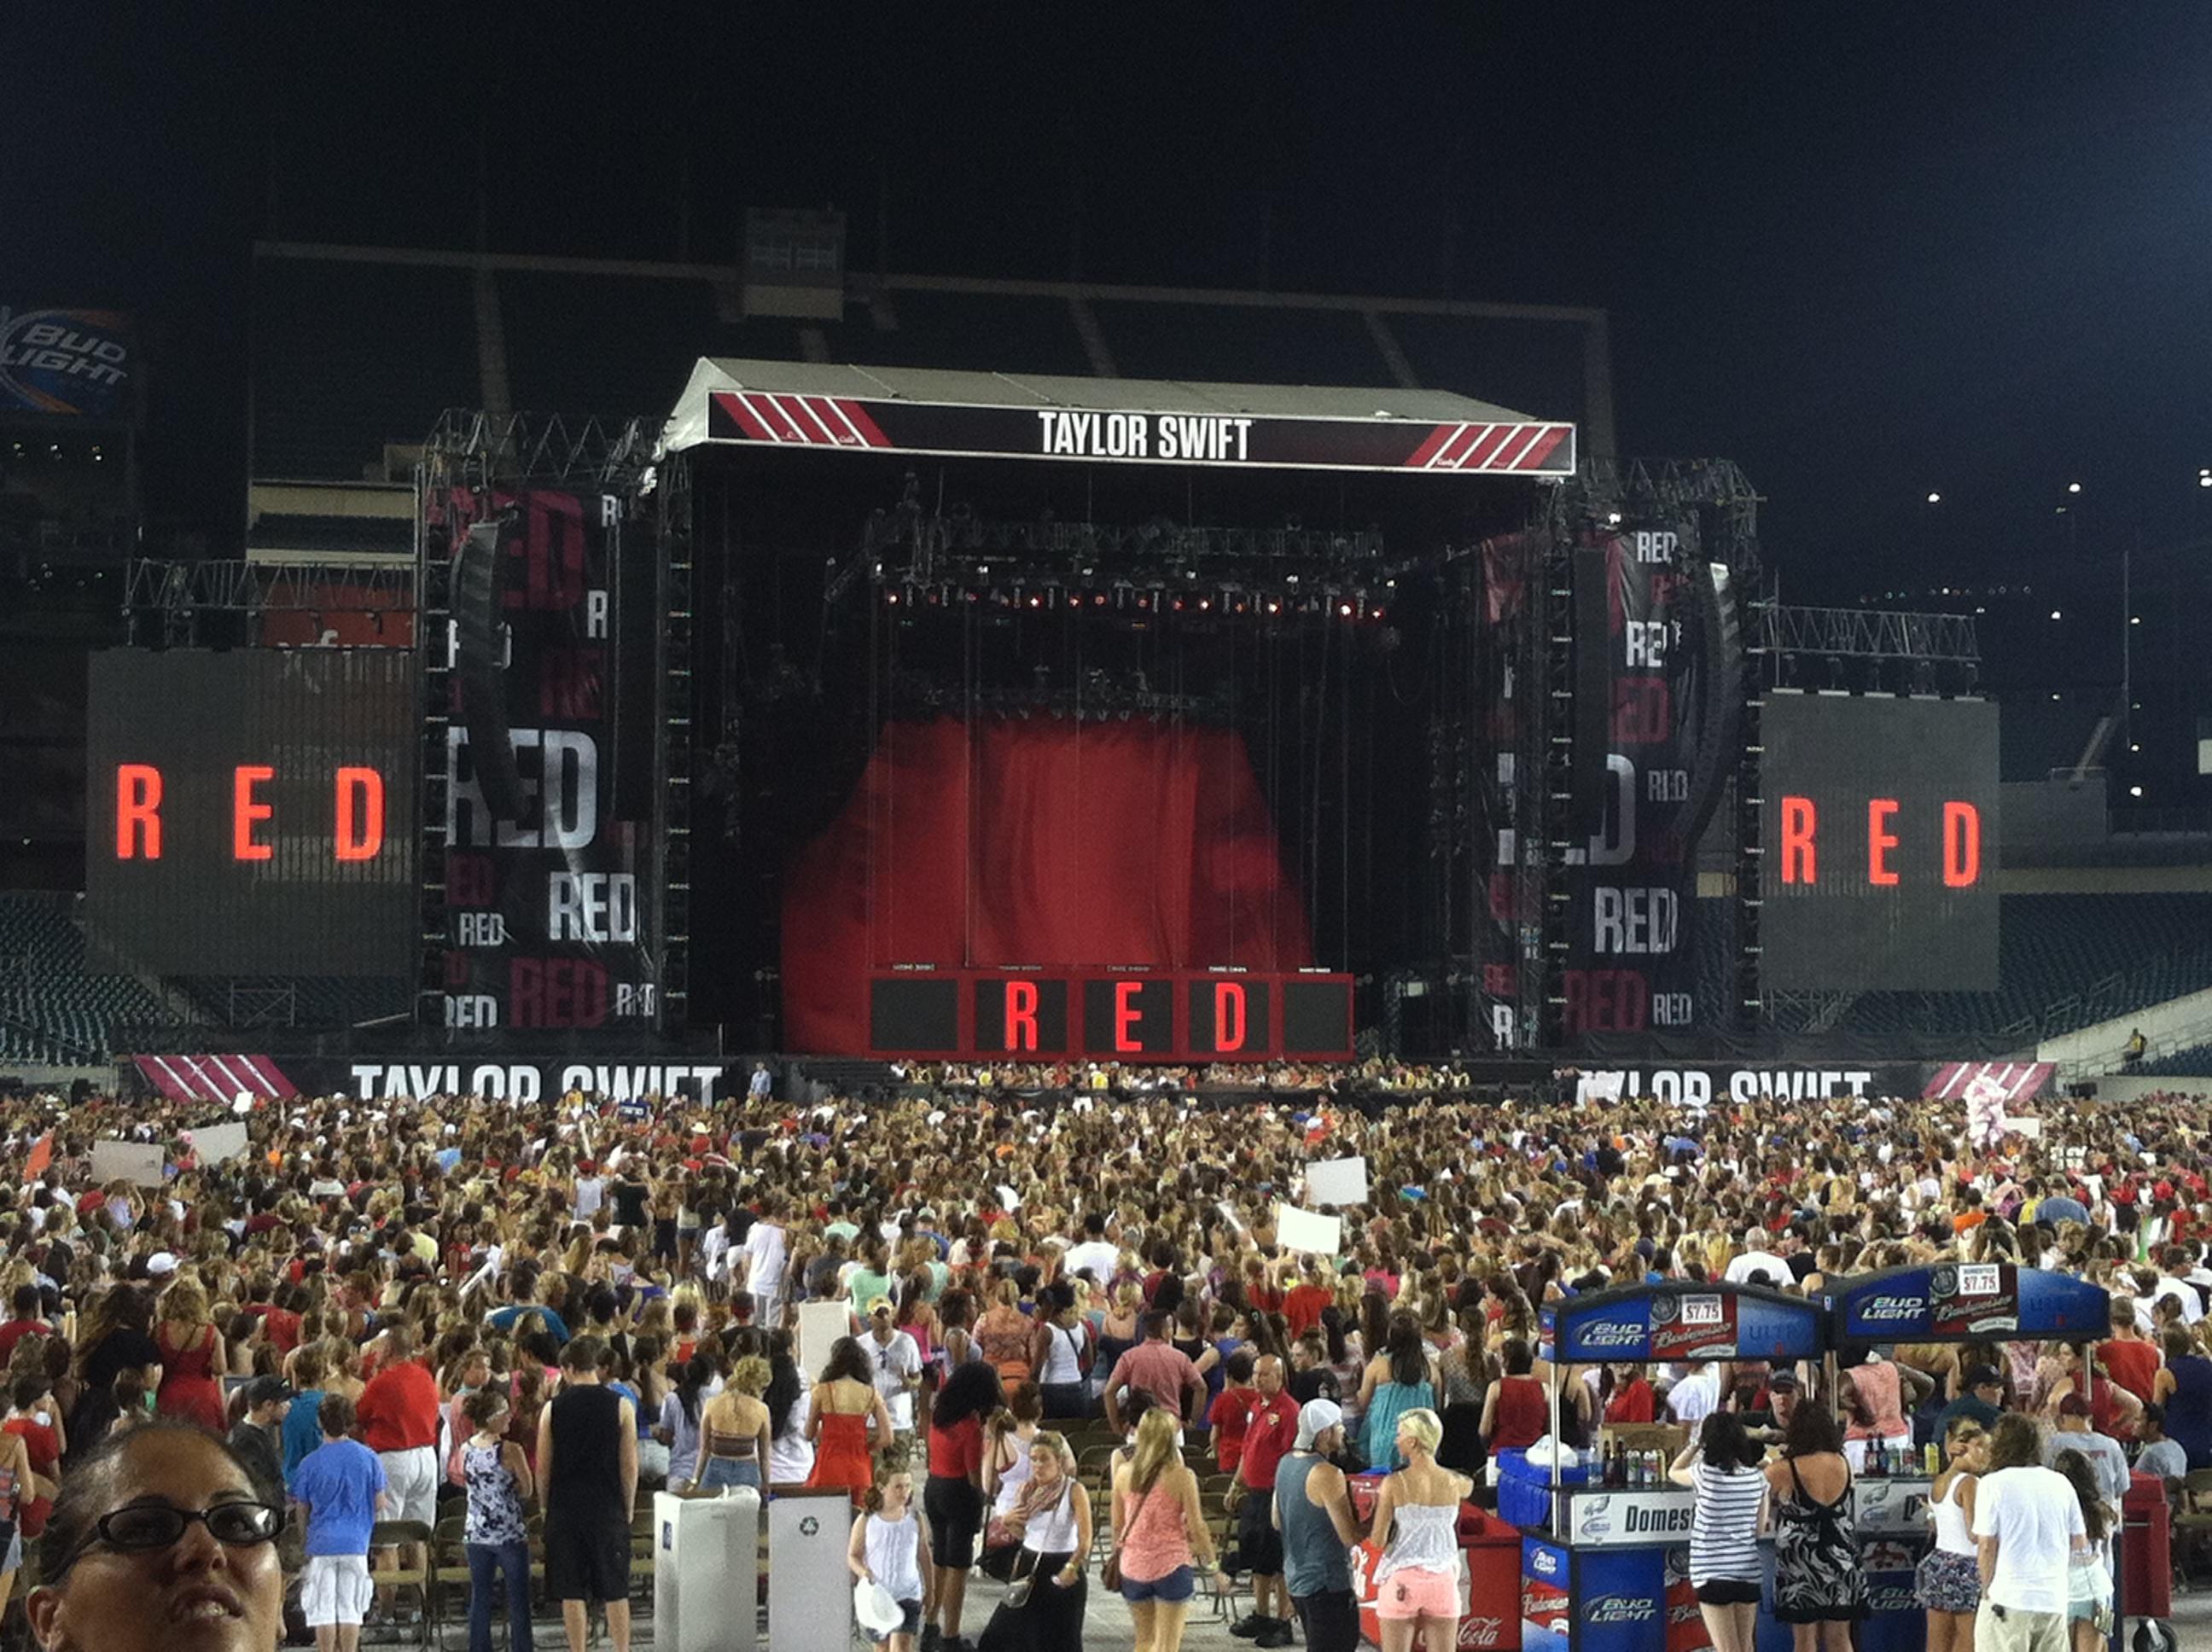 Taylor Swift Philadelphia 07 19 2013 Lincoln Financial